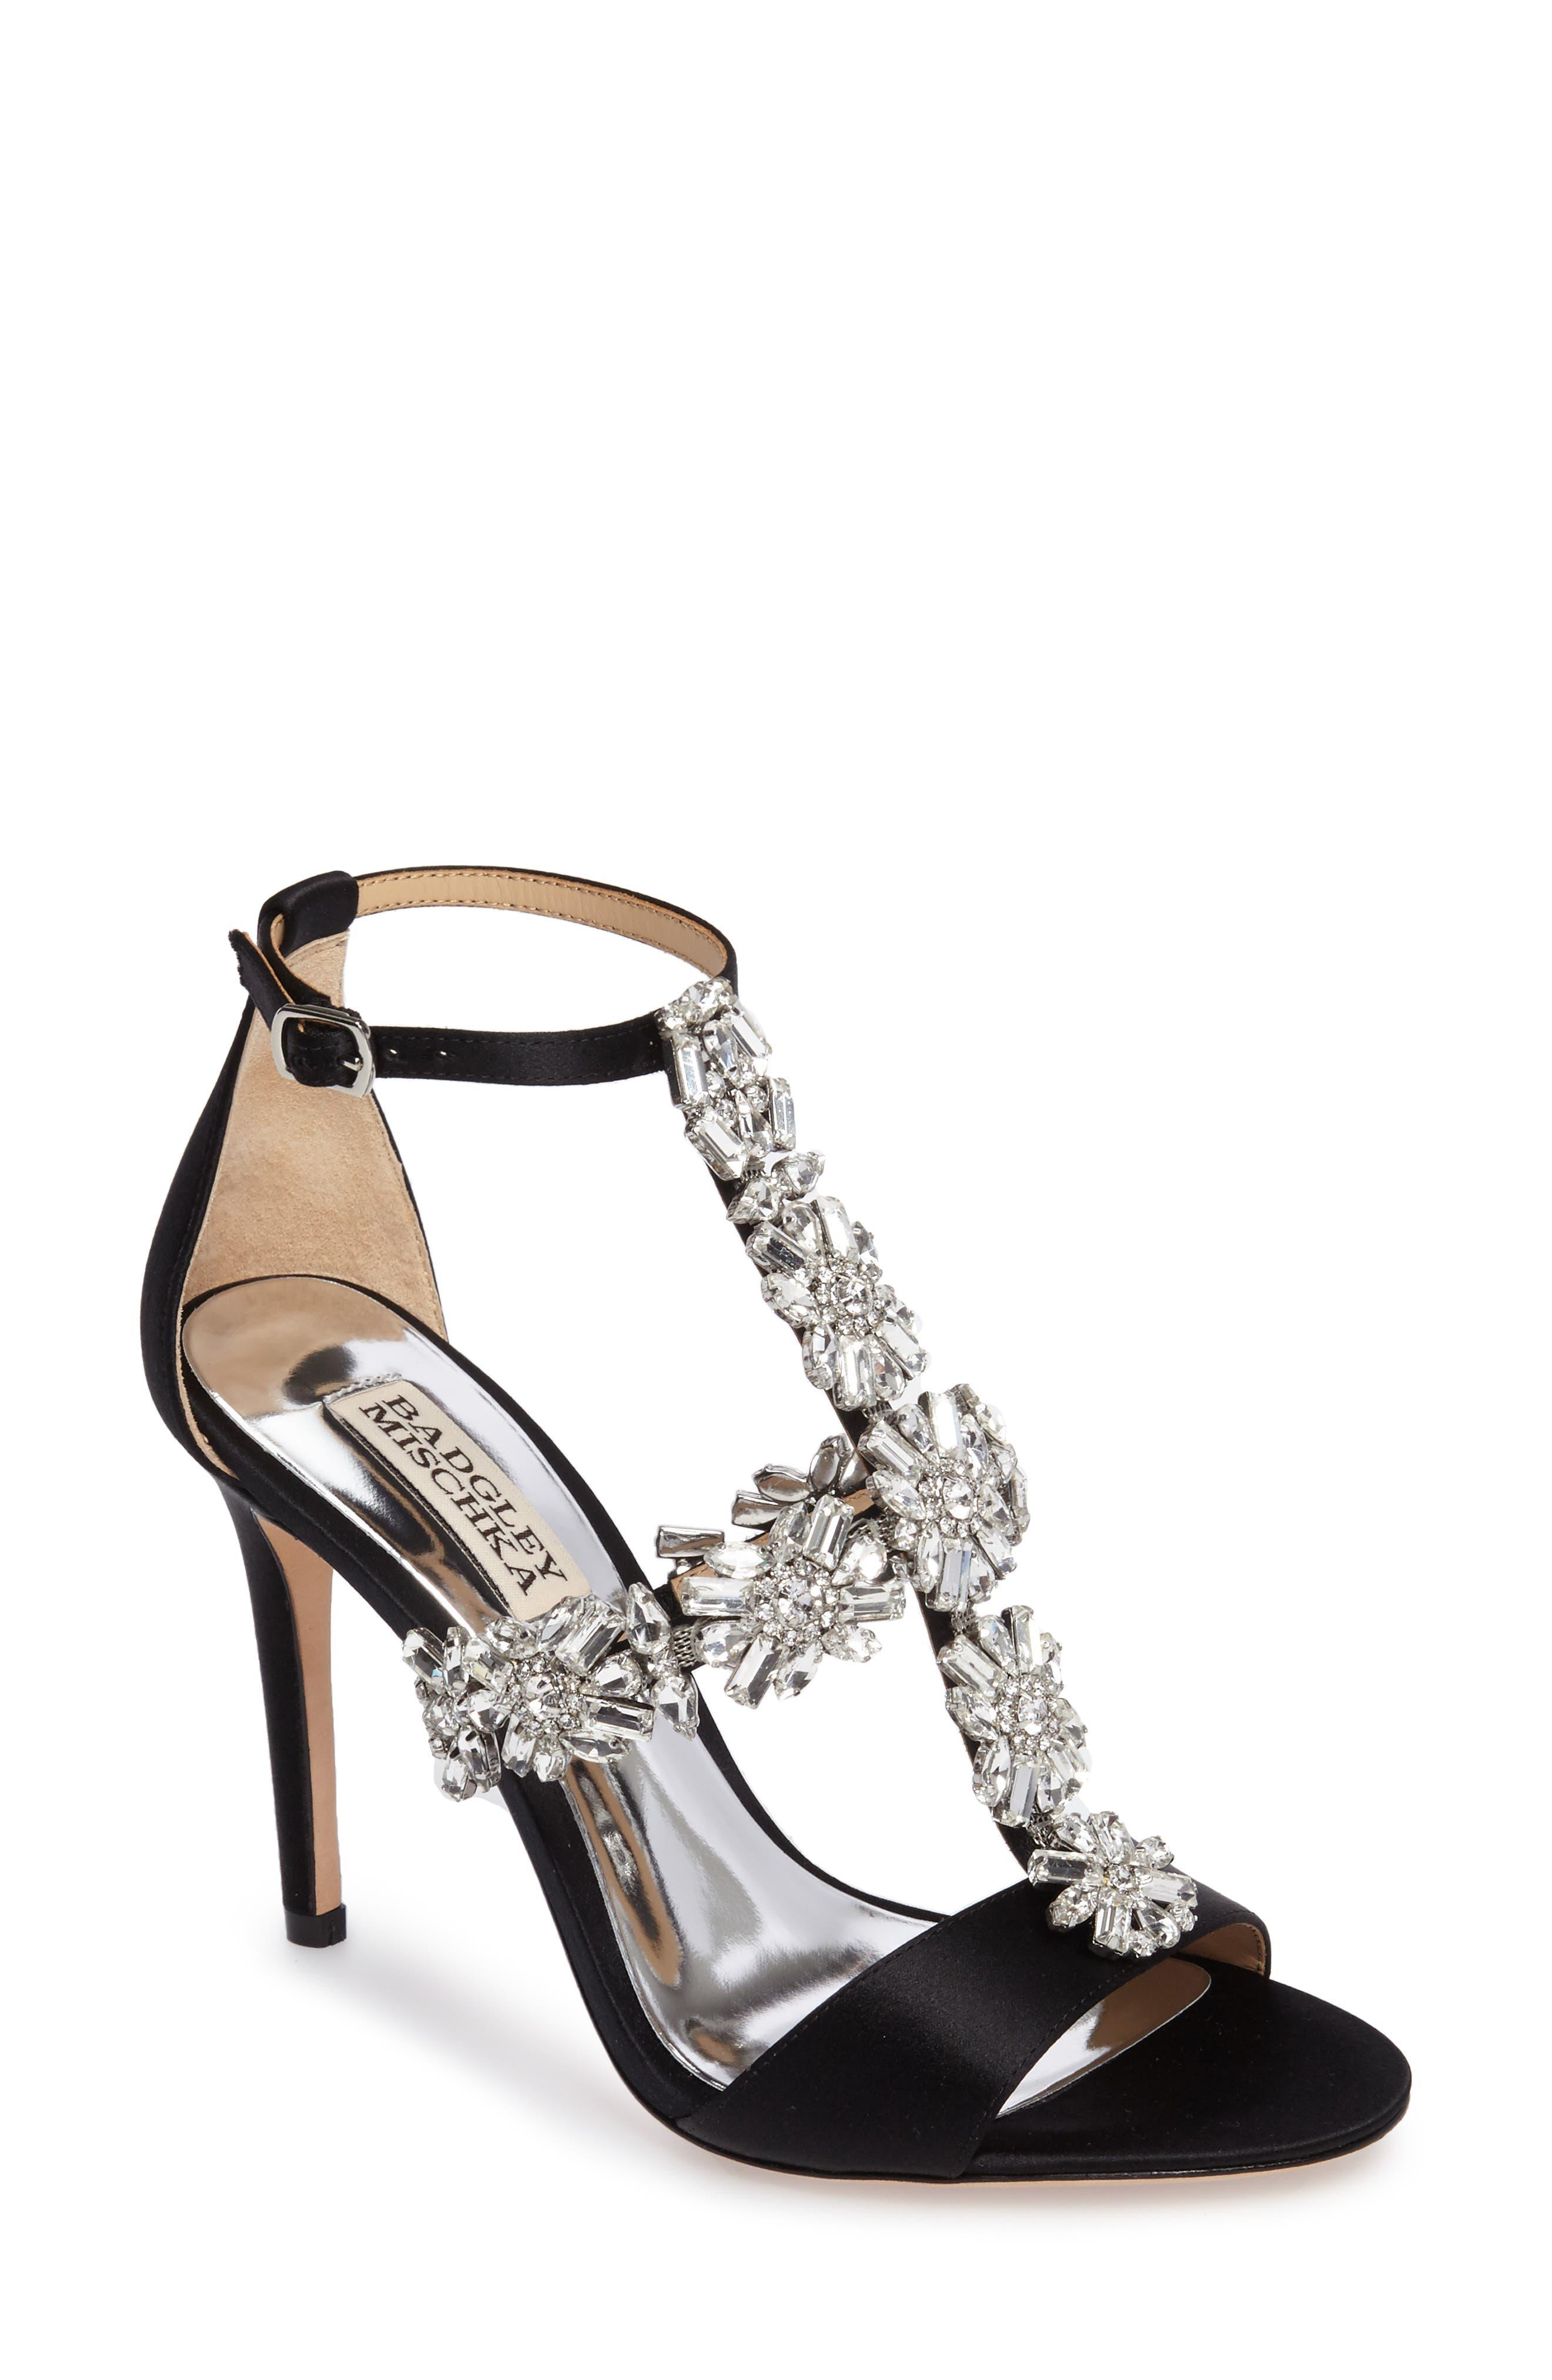 Alternate Image 1 Selected - Badgley Mischka Munroe Embellished Sandal (Women)